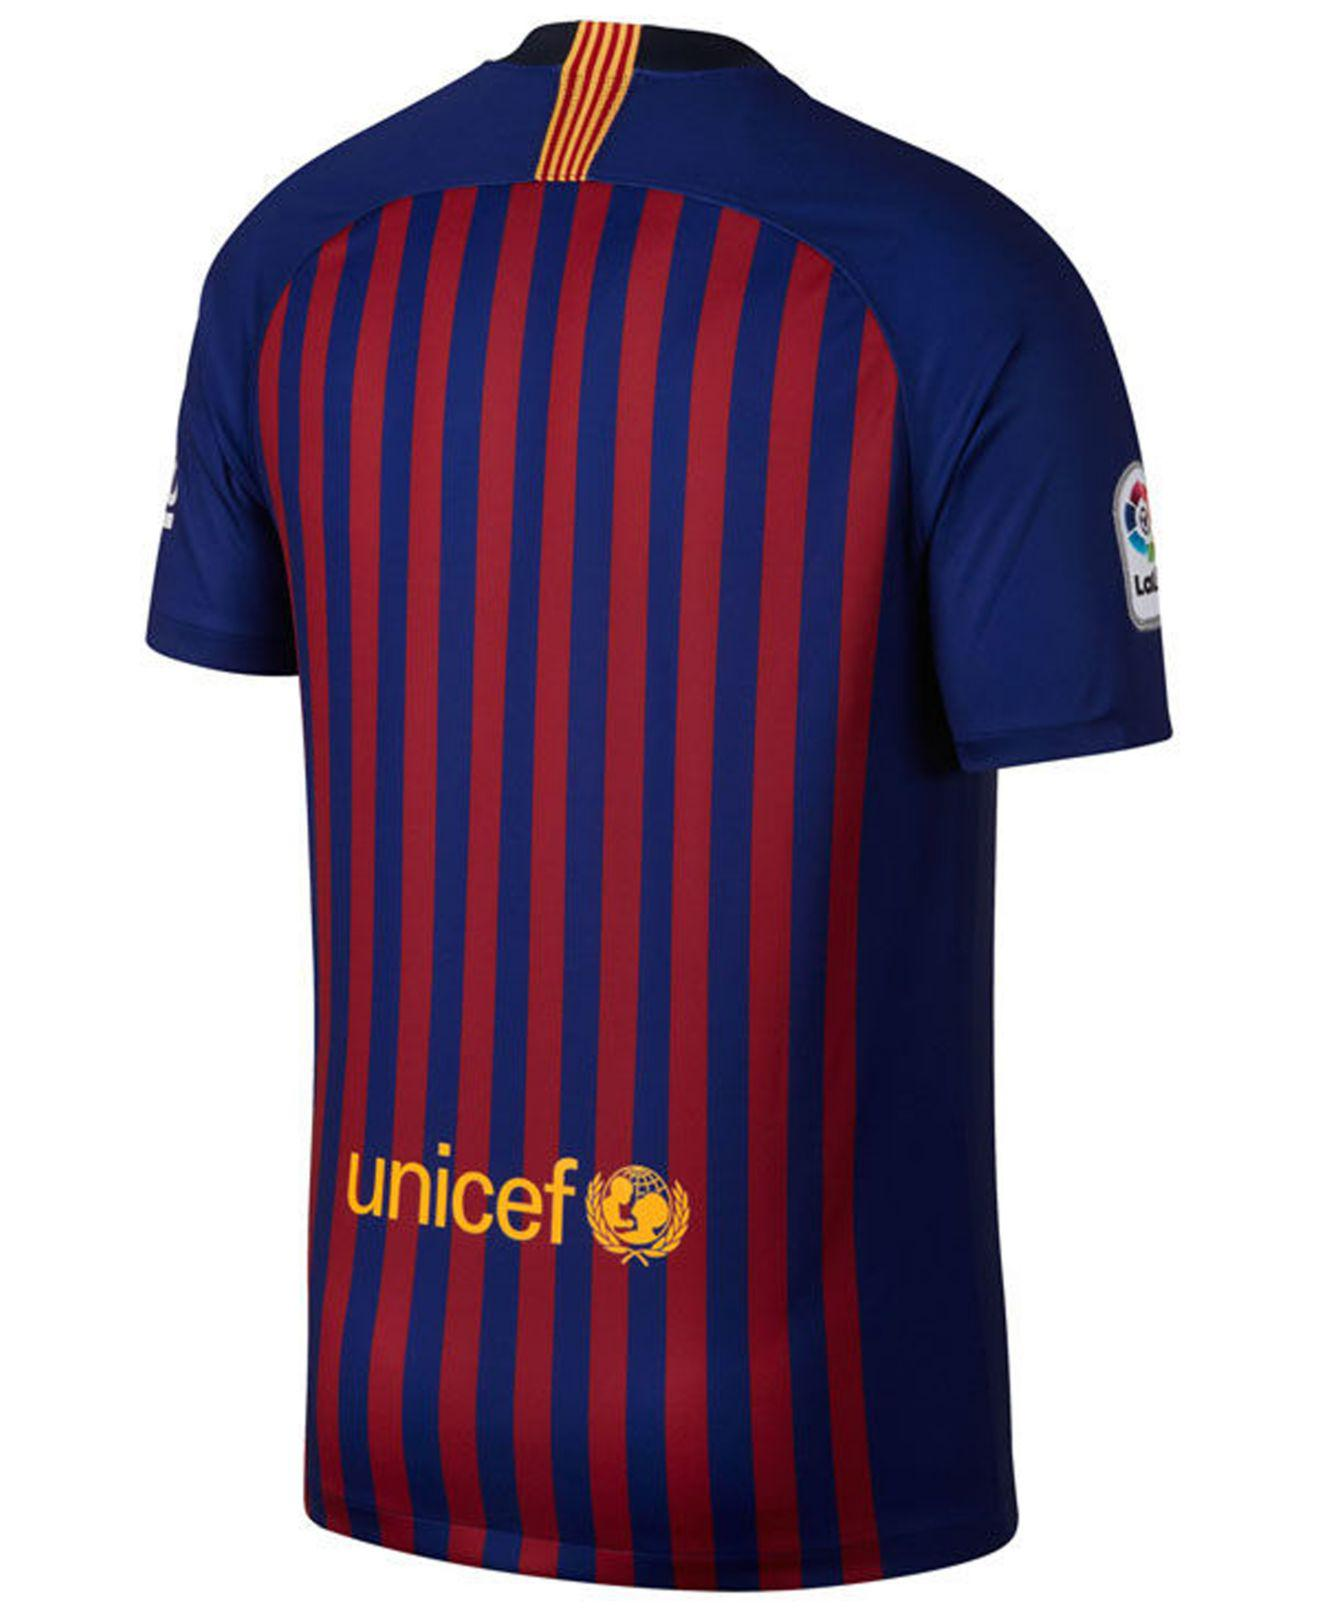 49db60b29cbbd Lyst - Nike 2018/19 Fc Barcelona Stadium Home Men's Soccer Jersey in Blue  for Men - Save 17%